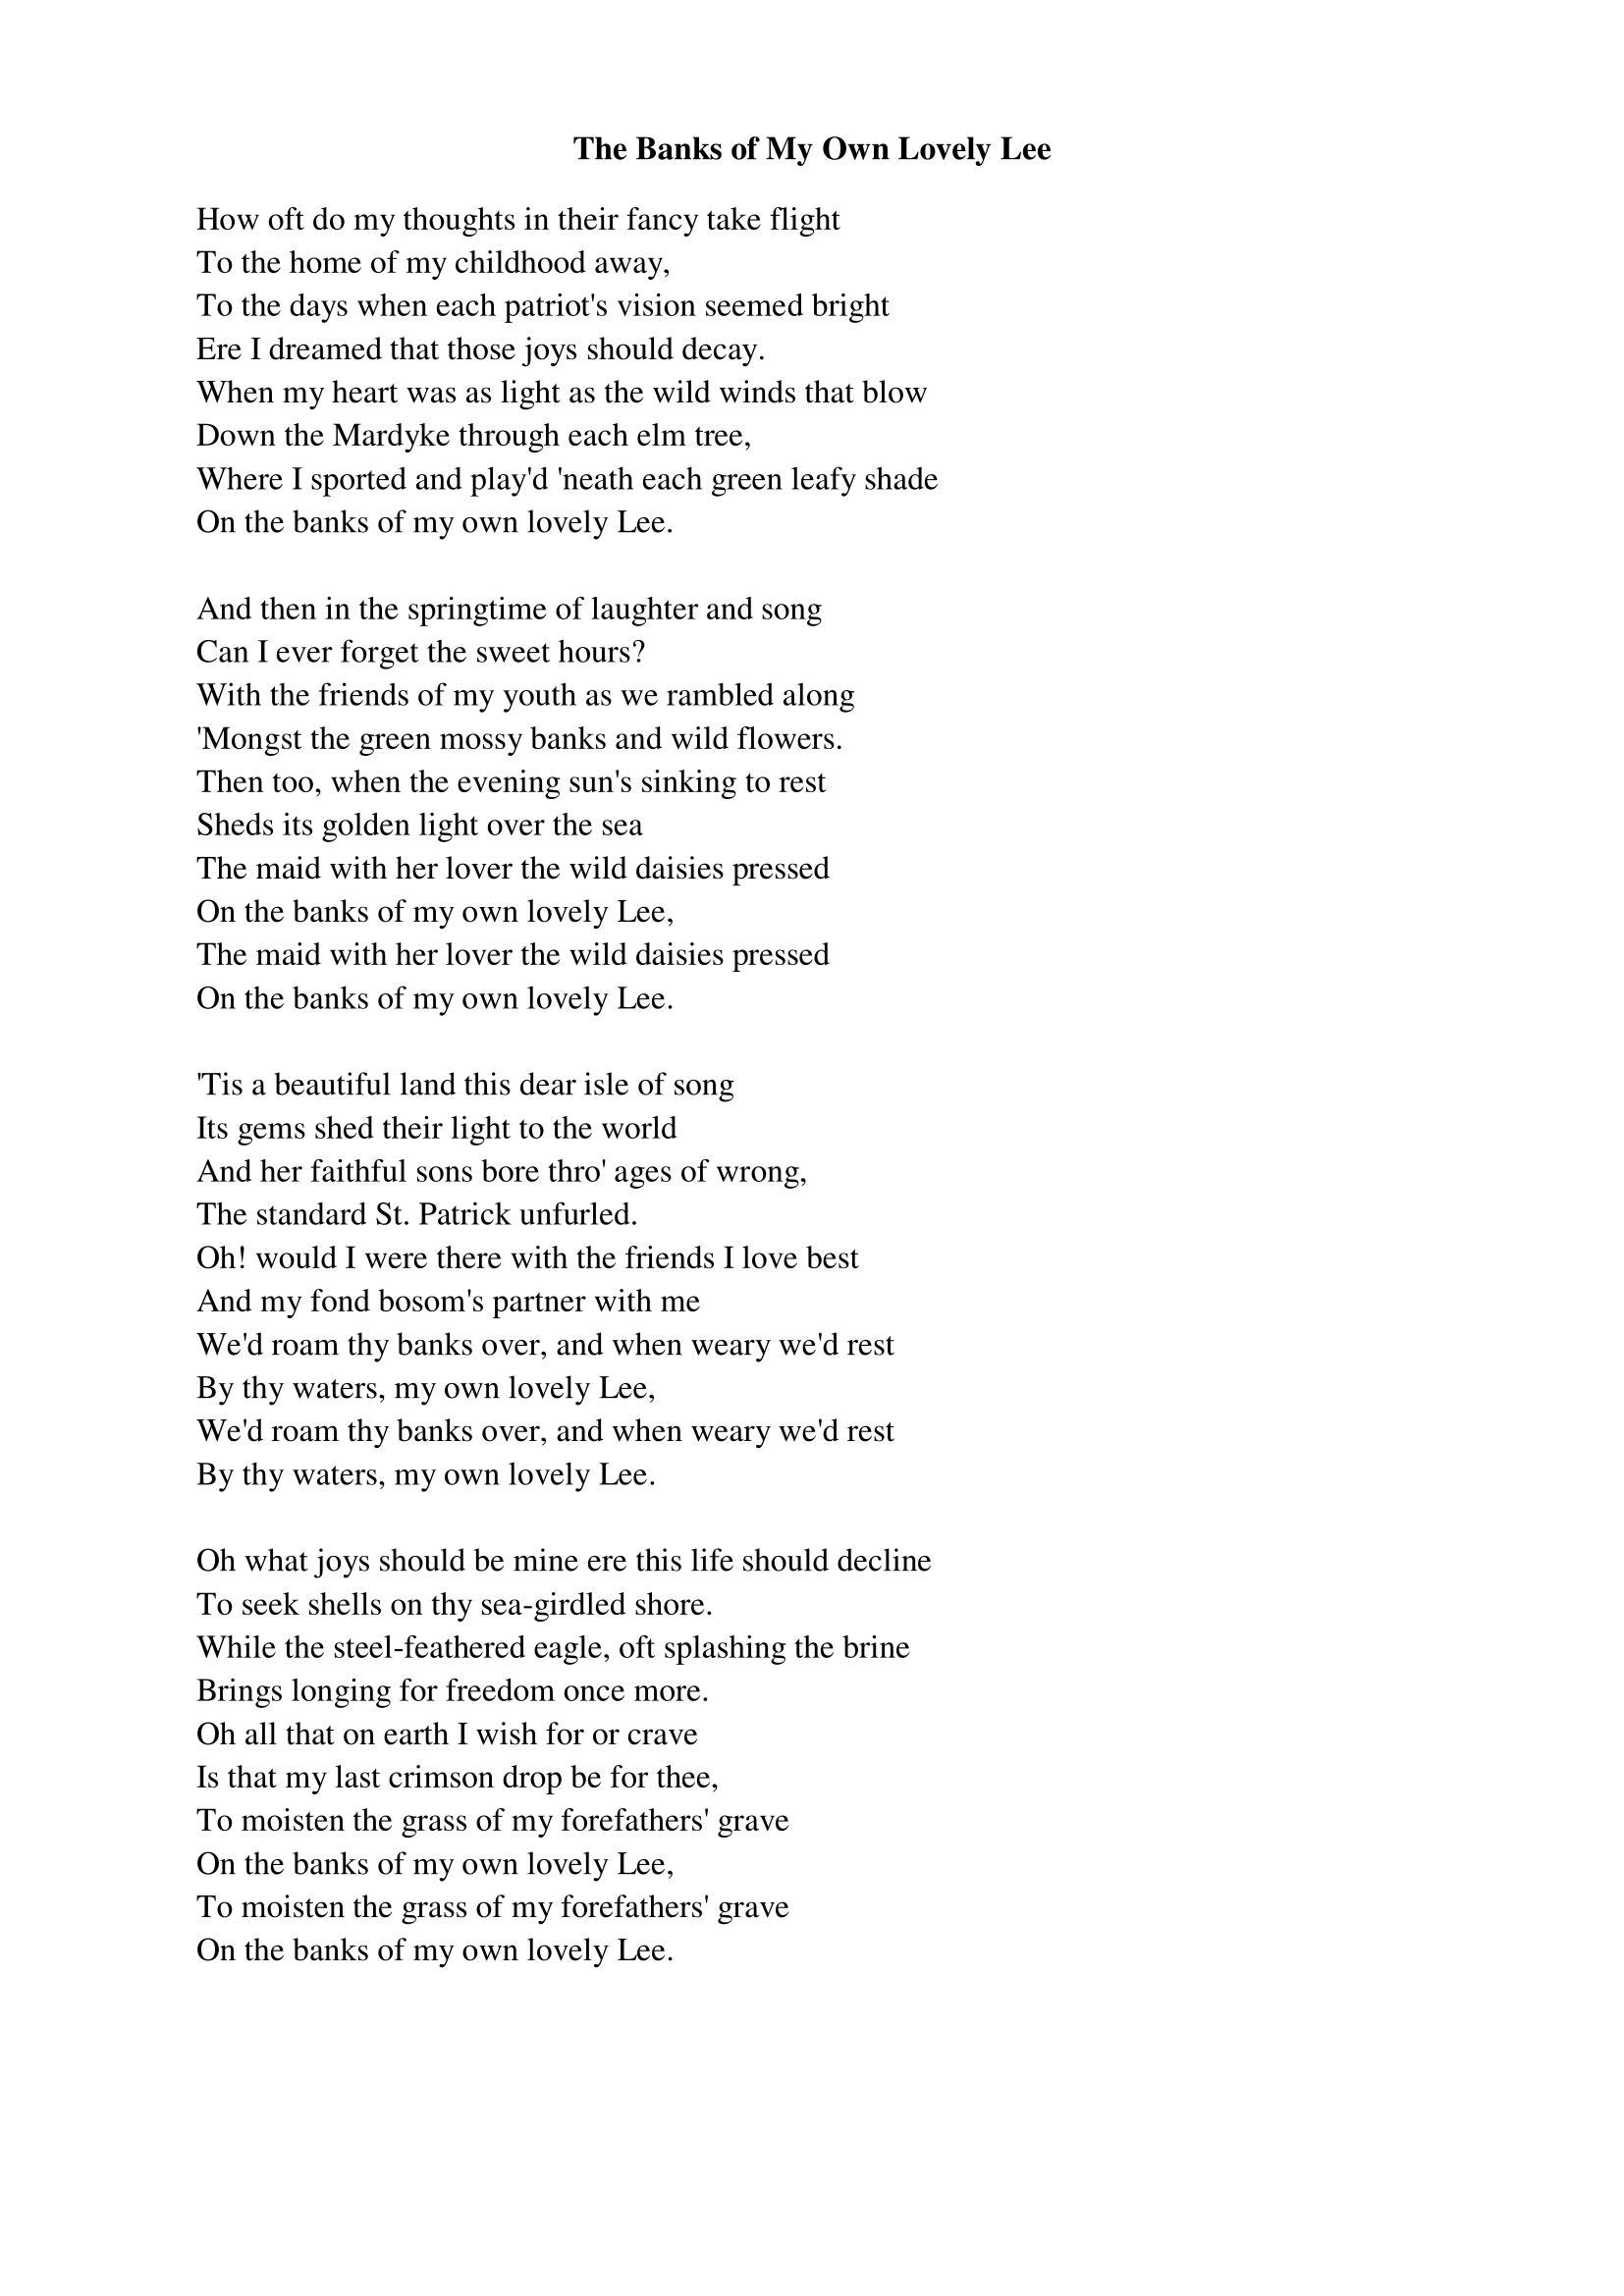 the-banks-of-my-own-lovely-lee-lyrics-1